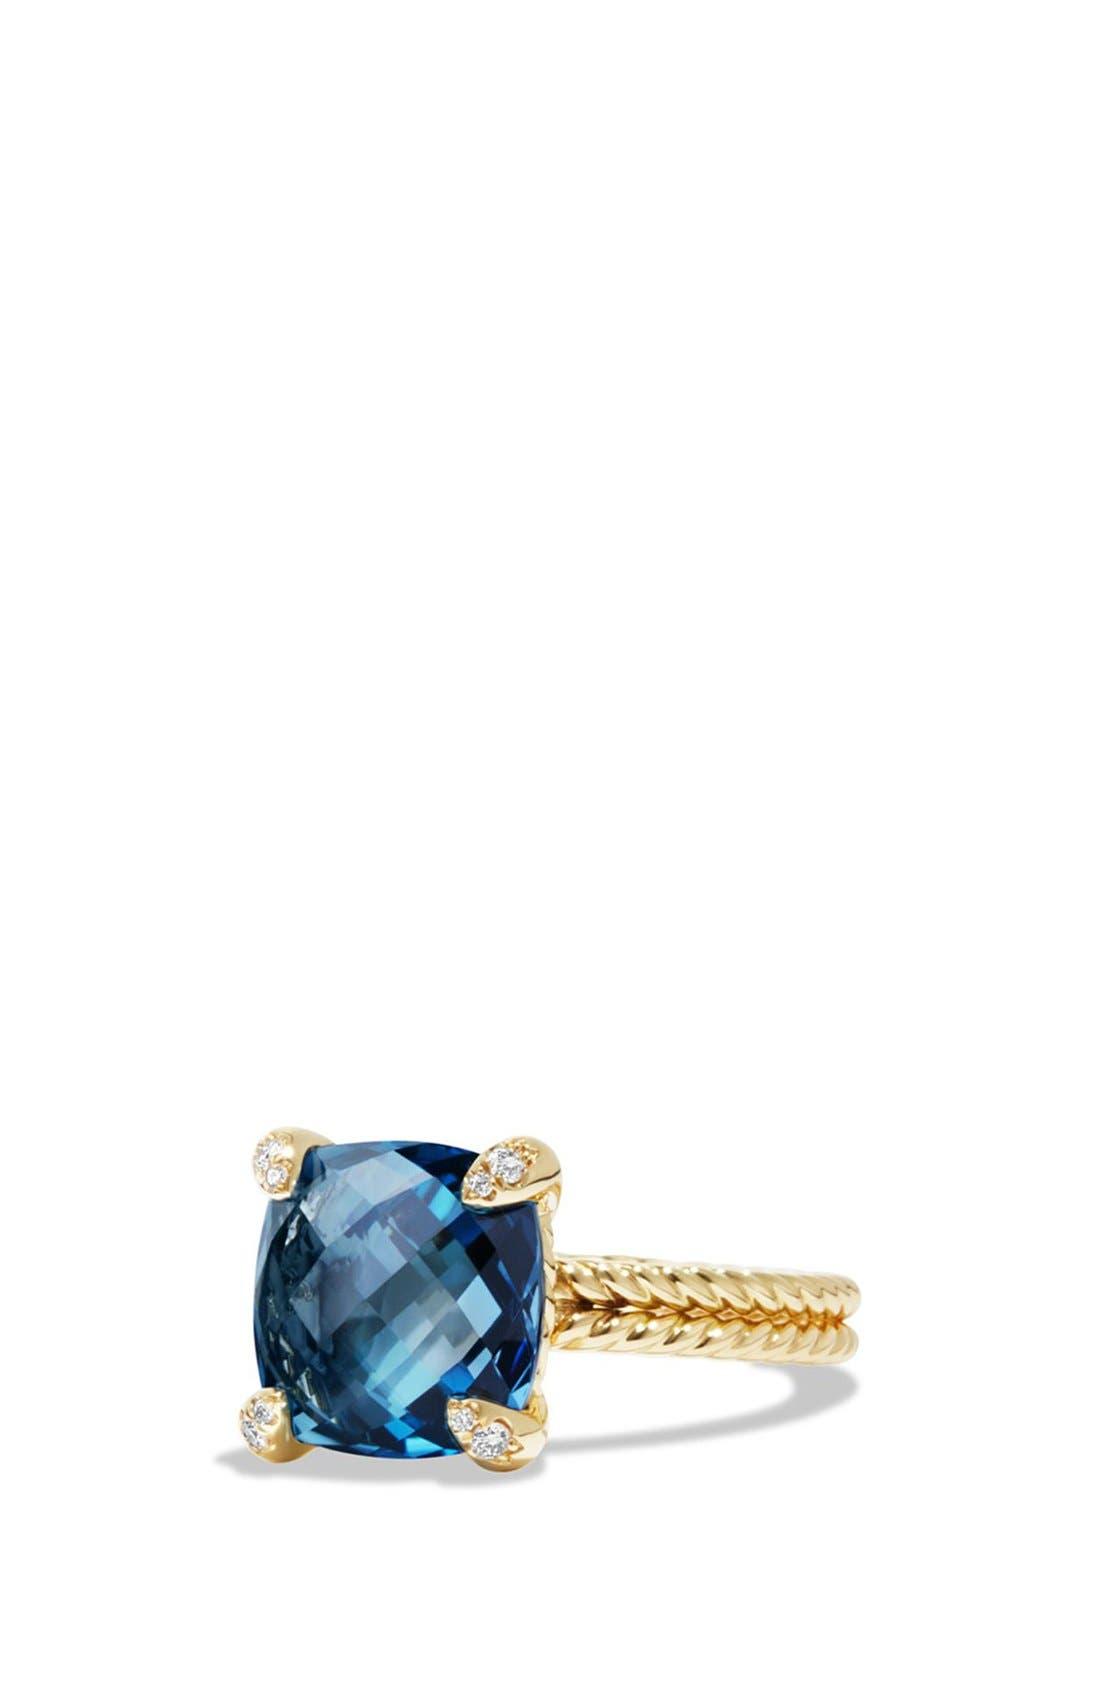 david yurman chtelaine ring with hampton blue topaz and diamonds in 18k gold